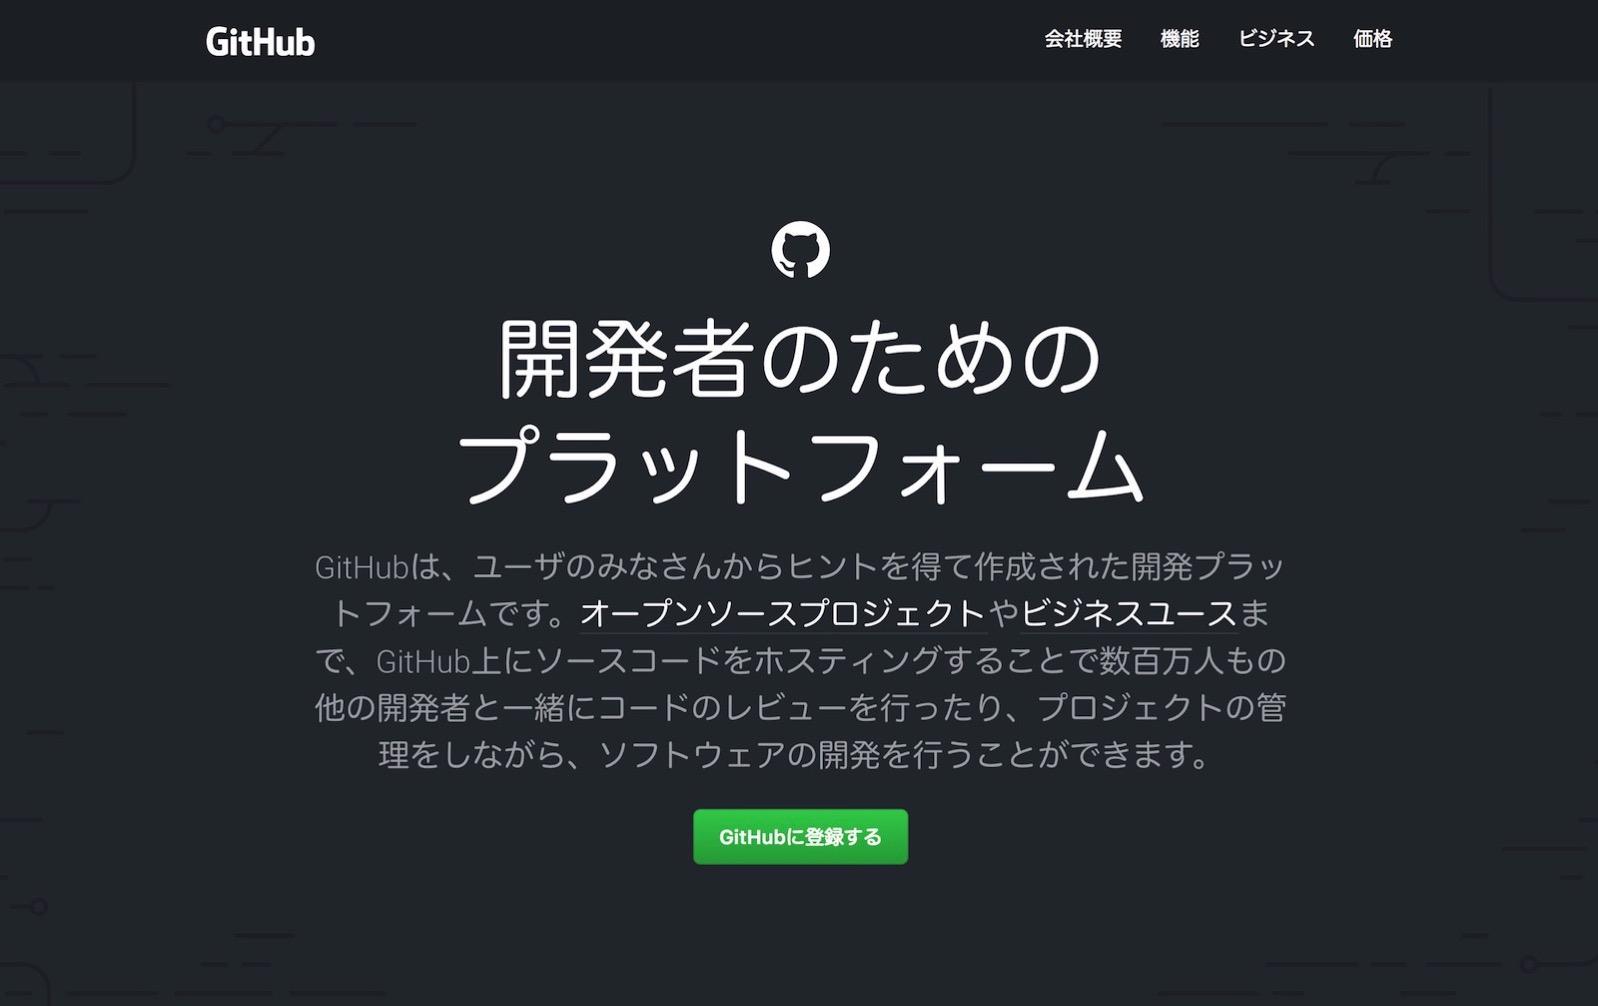 github-japan.jpg